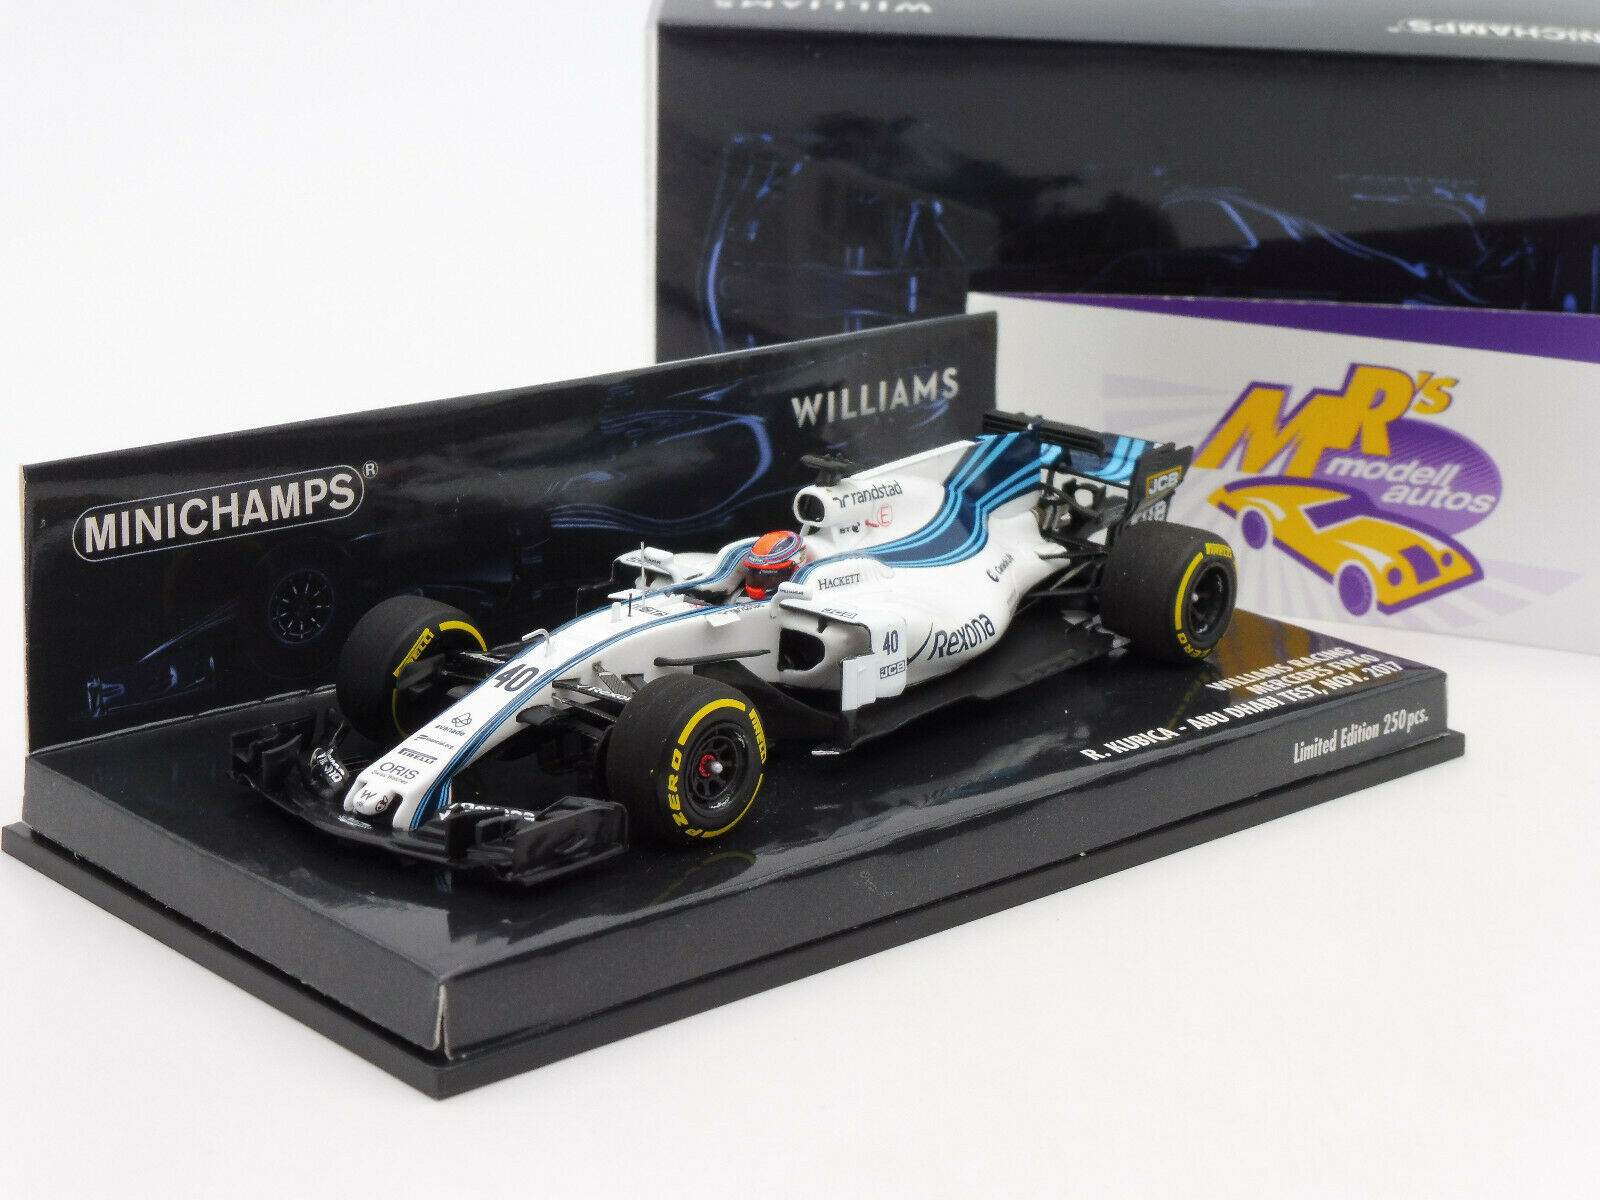 suministro de productos de calidad Minichamps 417172040     Williams Racing mercedes fw40  kubica-Abu Dhabi  1 43  orden en línea